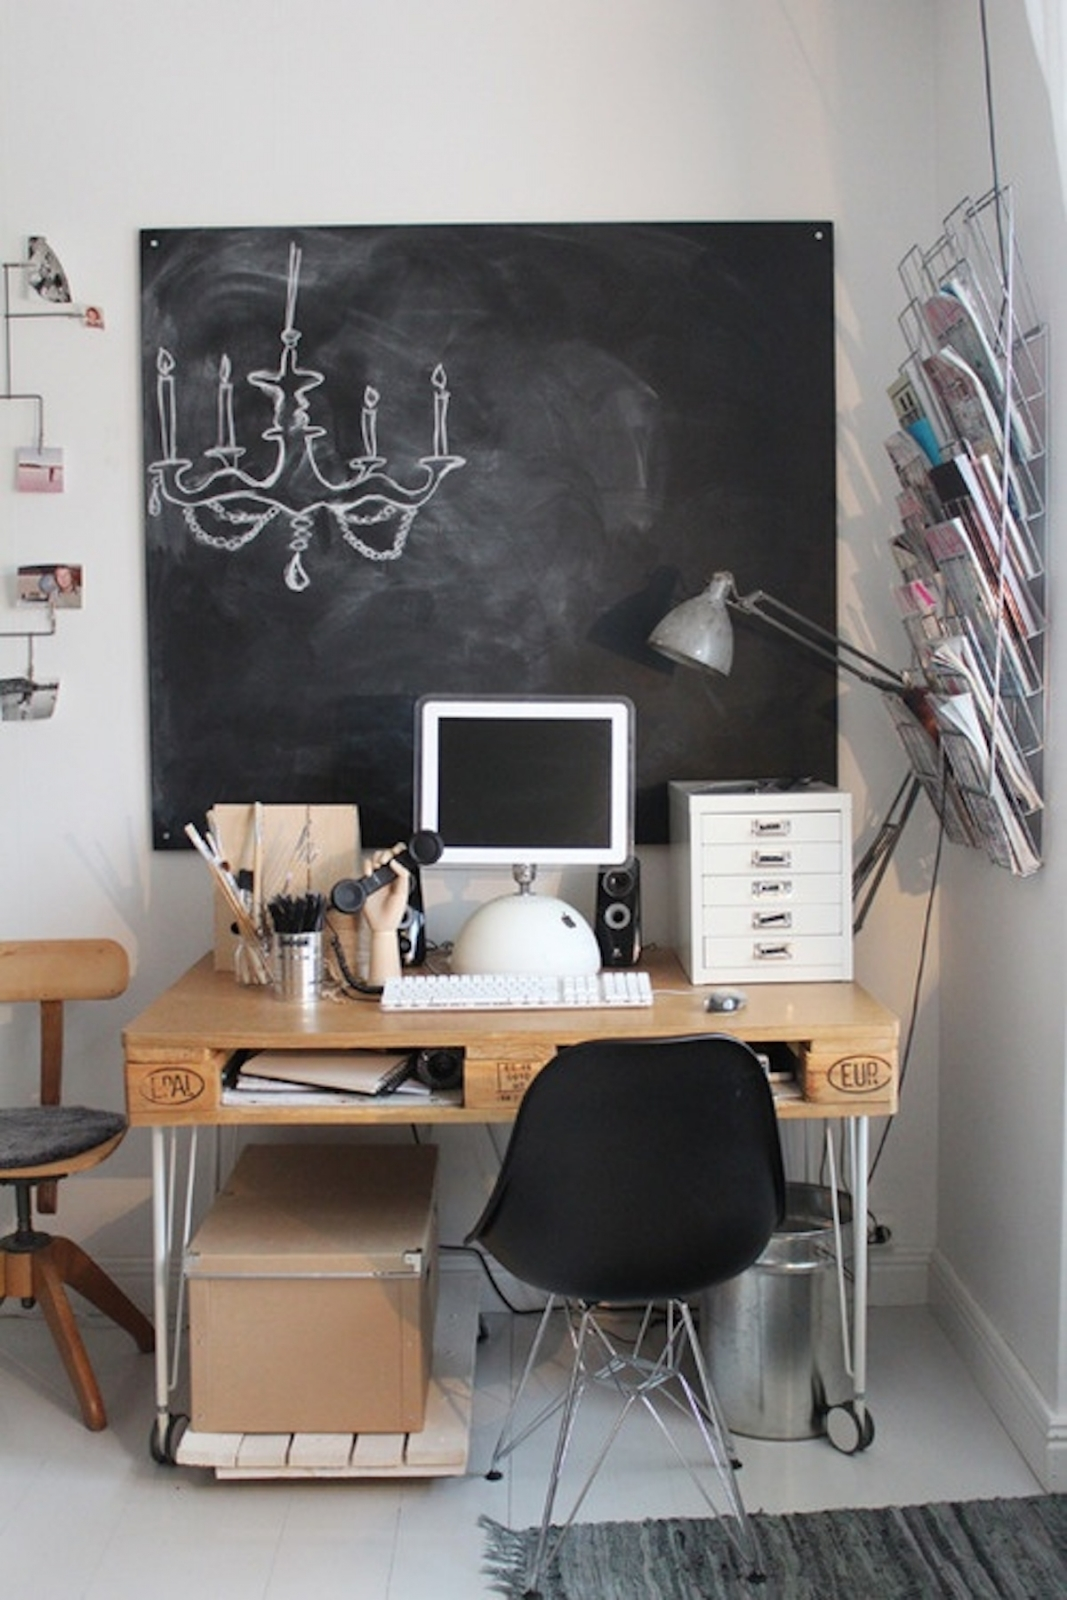 50 best creative pallet furniture design ideas for 2017 - Creative office desk ideas ...